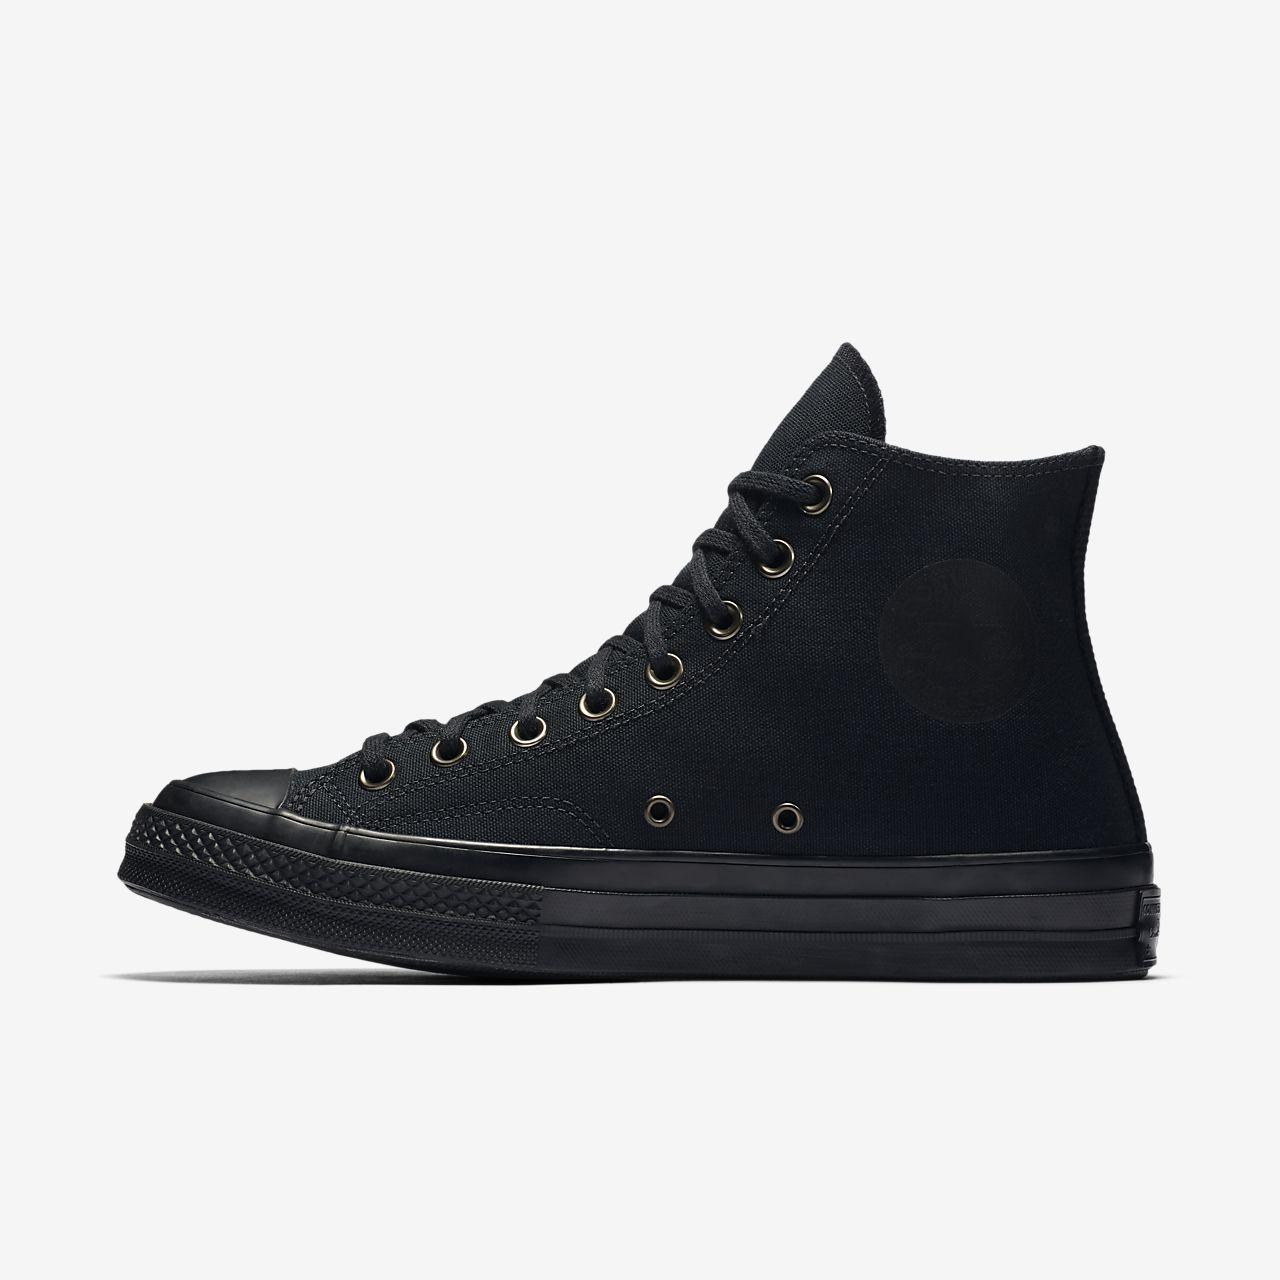 Converse Chuck Taylor 70 High Top Mens Shoe Nike